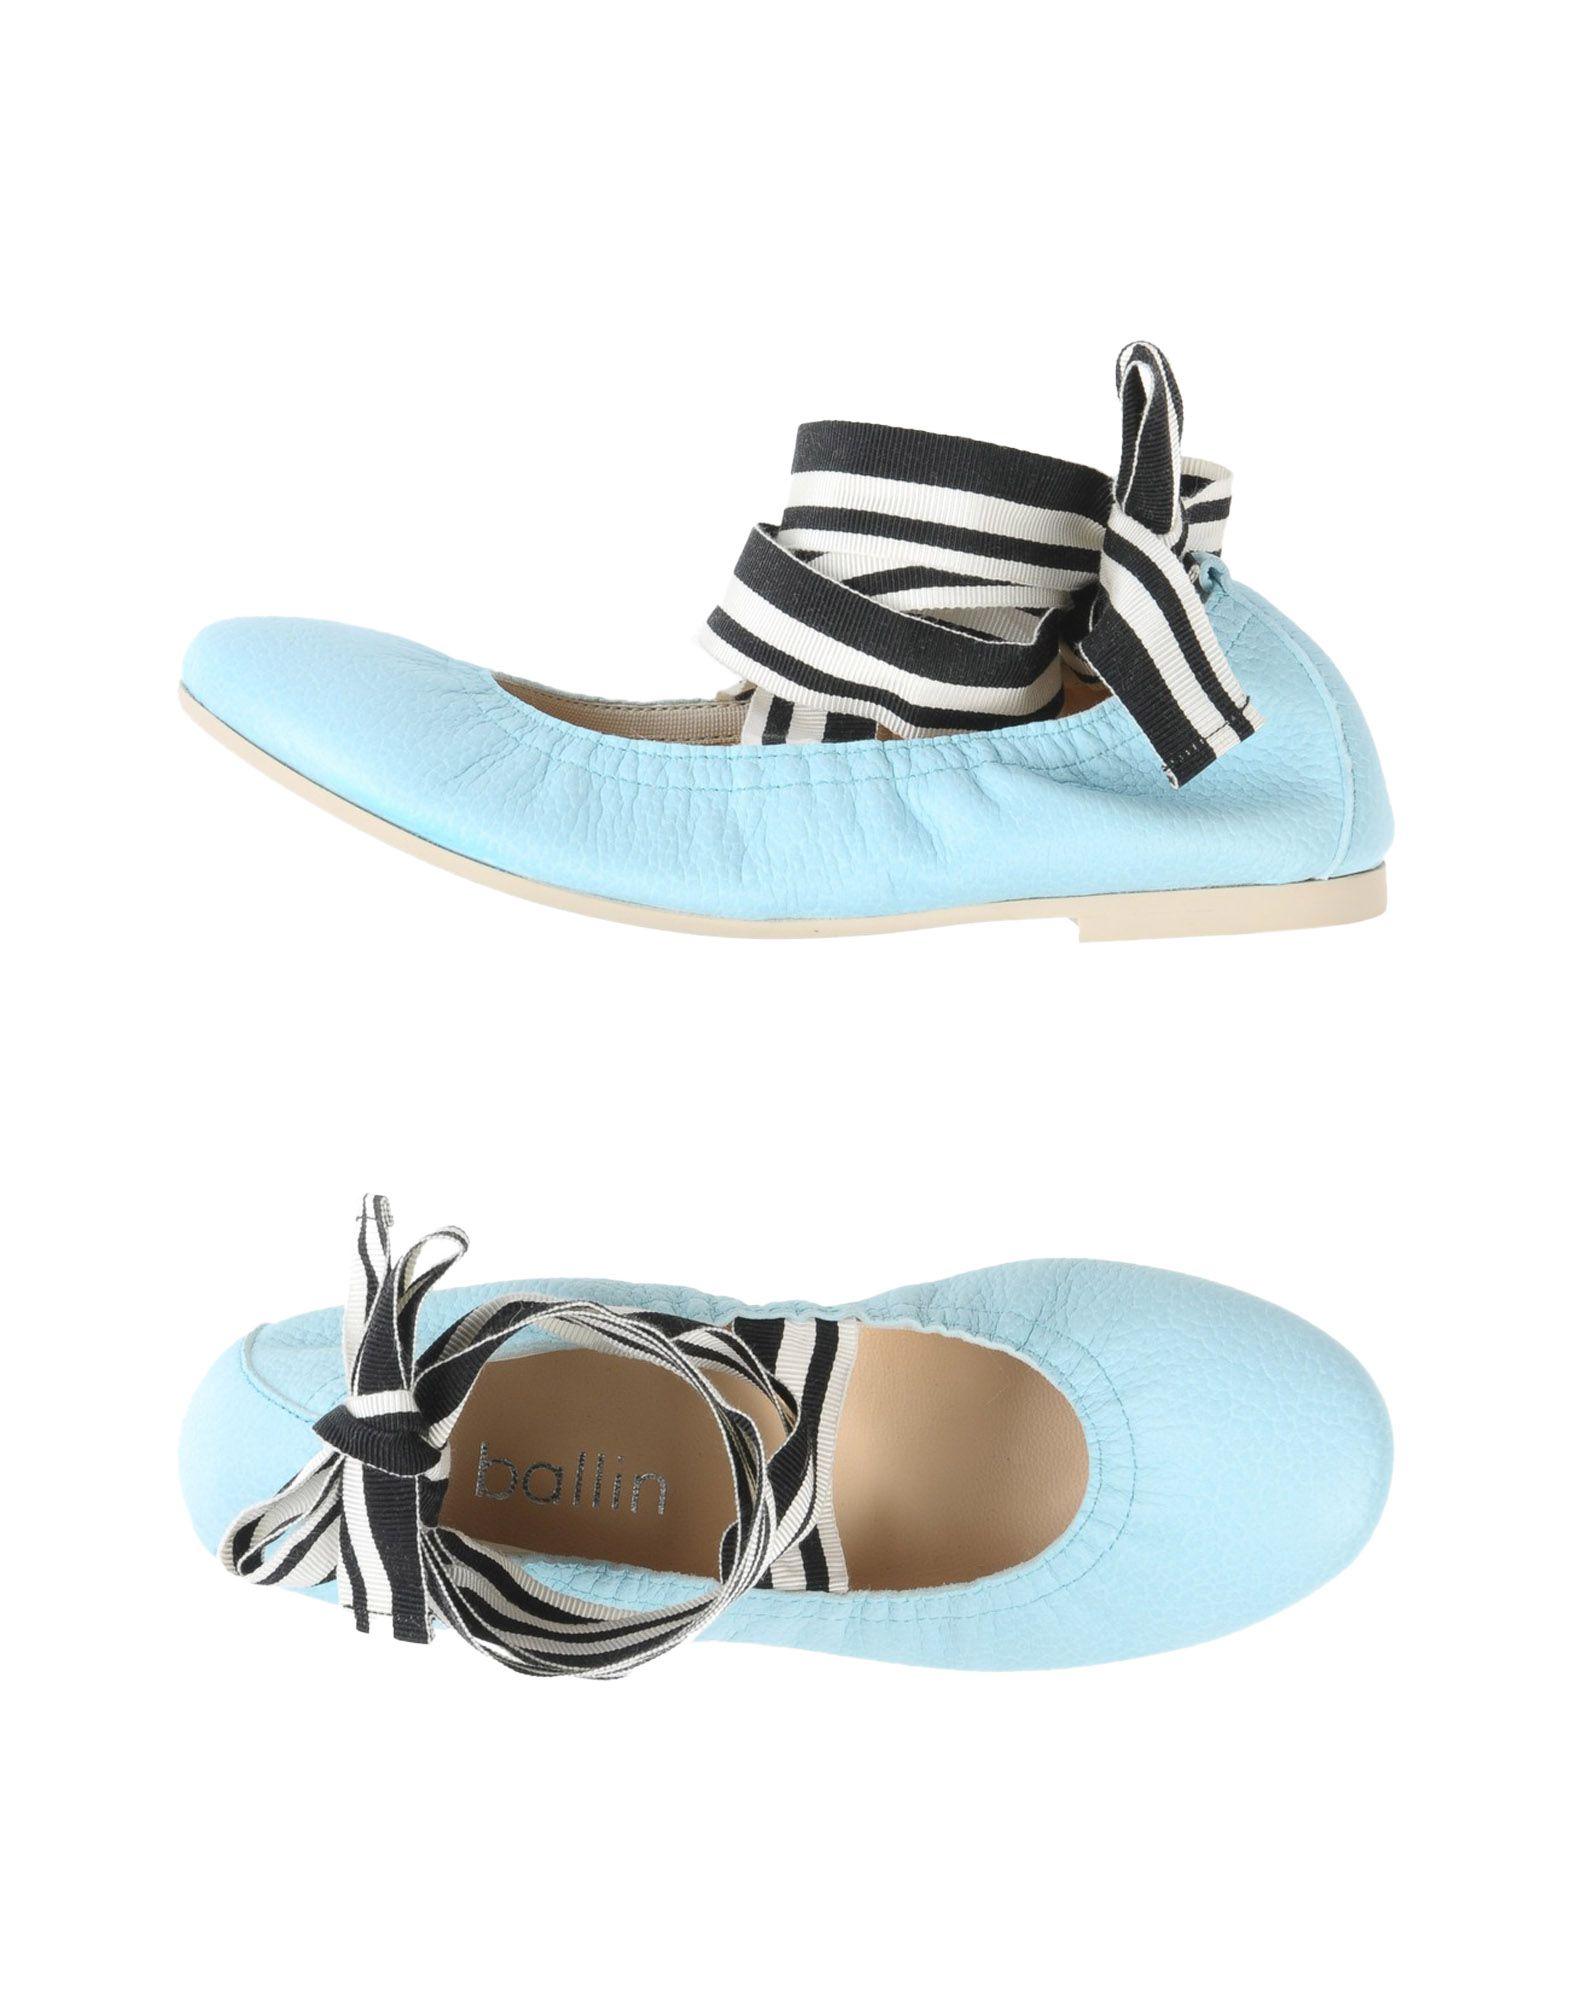 Ballin Ballerinas Damen  11399553RQ Gute Qualität beliebte Schuhe